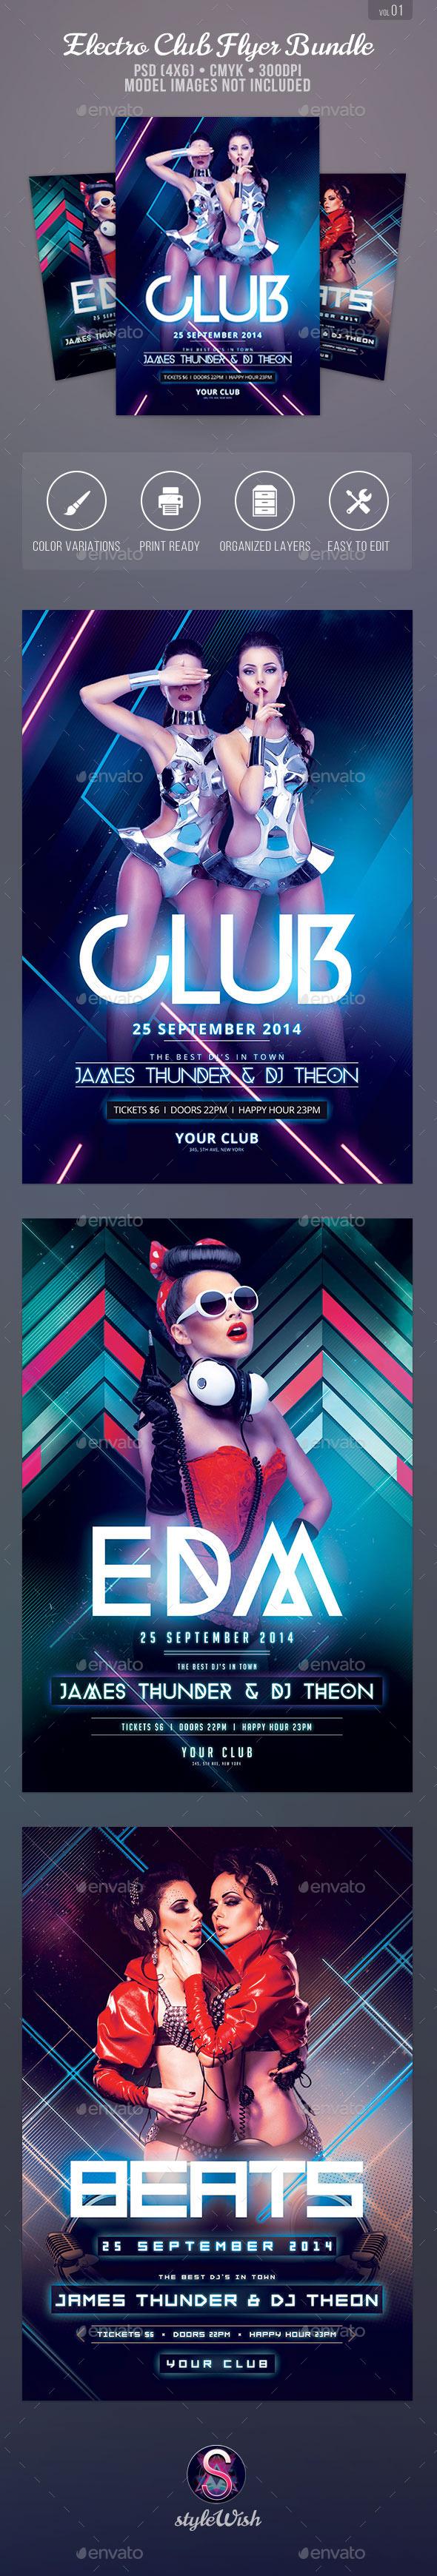 Electro Club Flyer Bundle - Clubs & Parties Events